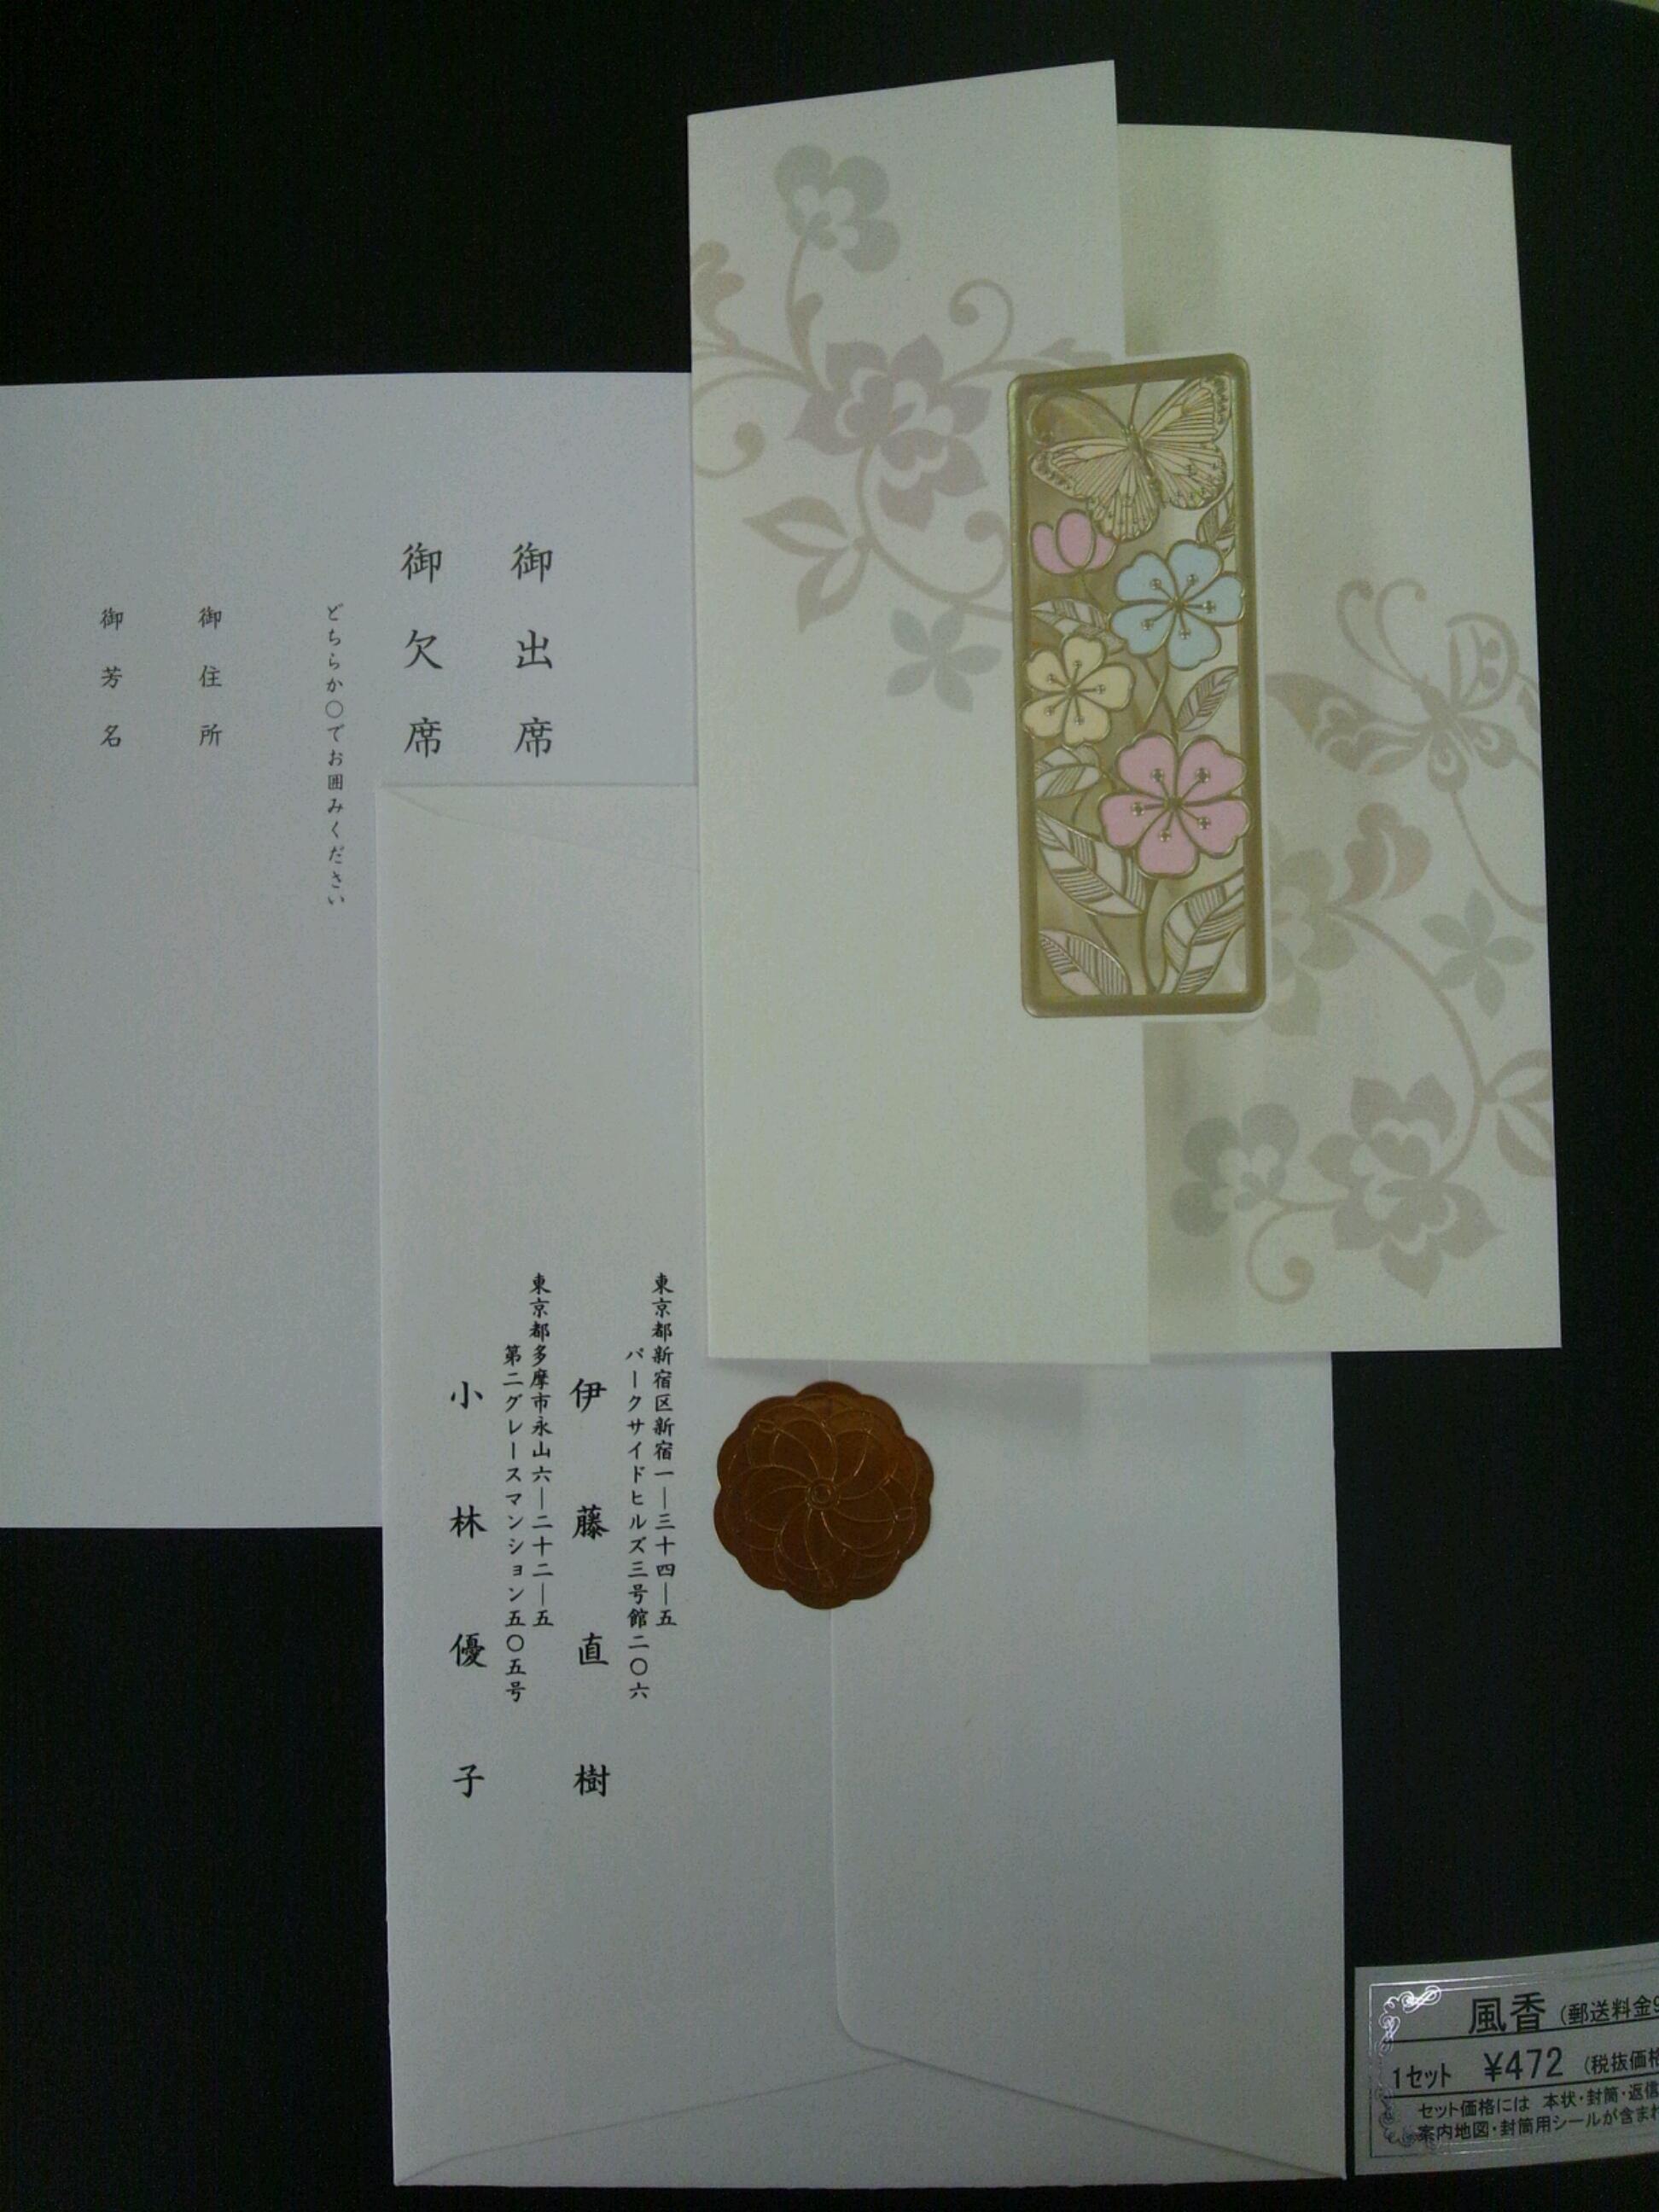 THE GRAND CREER - 名古屋の結婚式場。「スイートルームウエディング」 ザ グランクレール